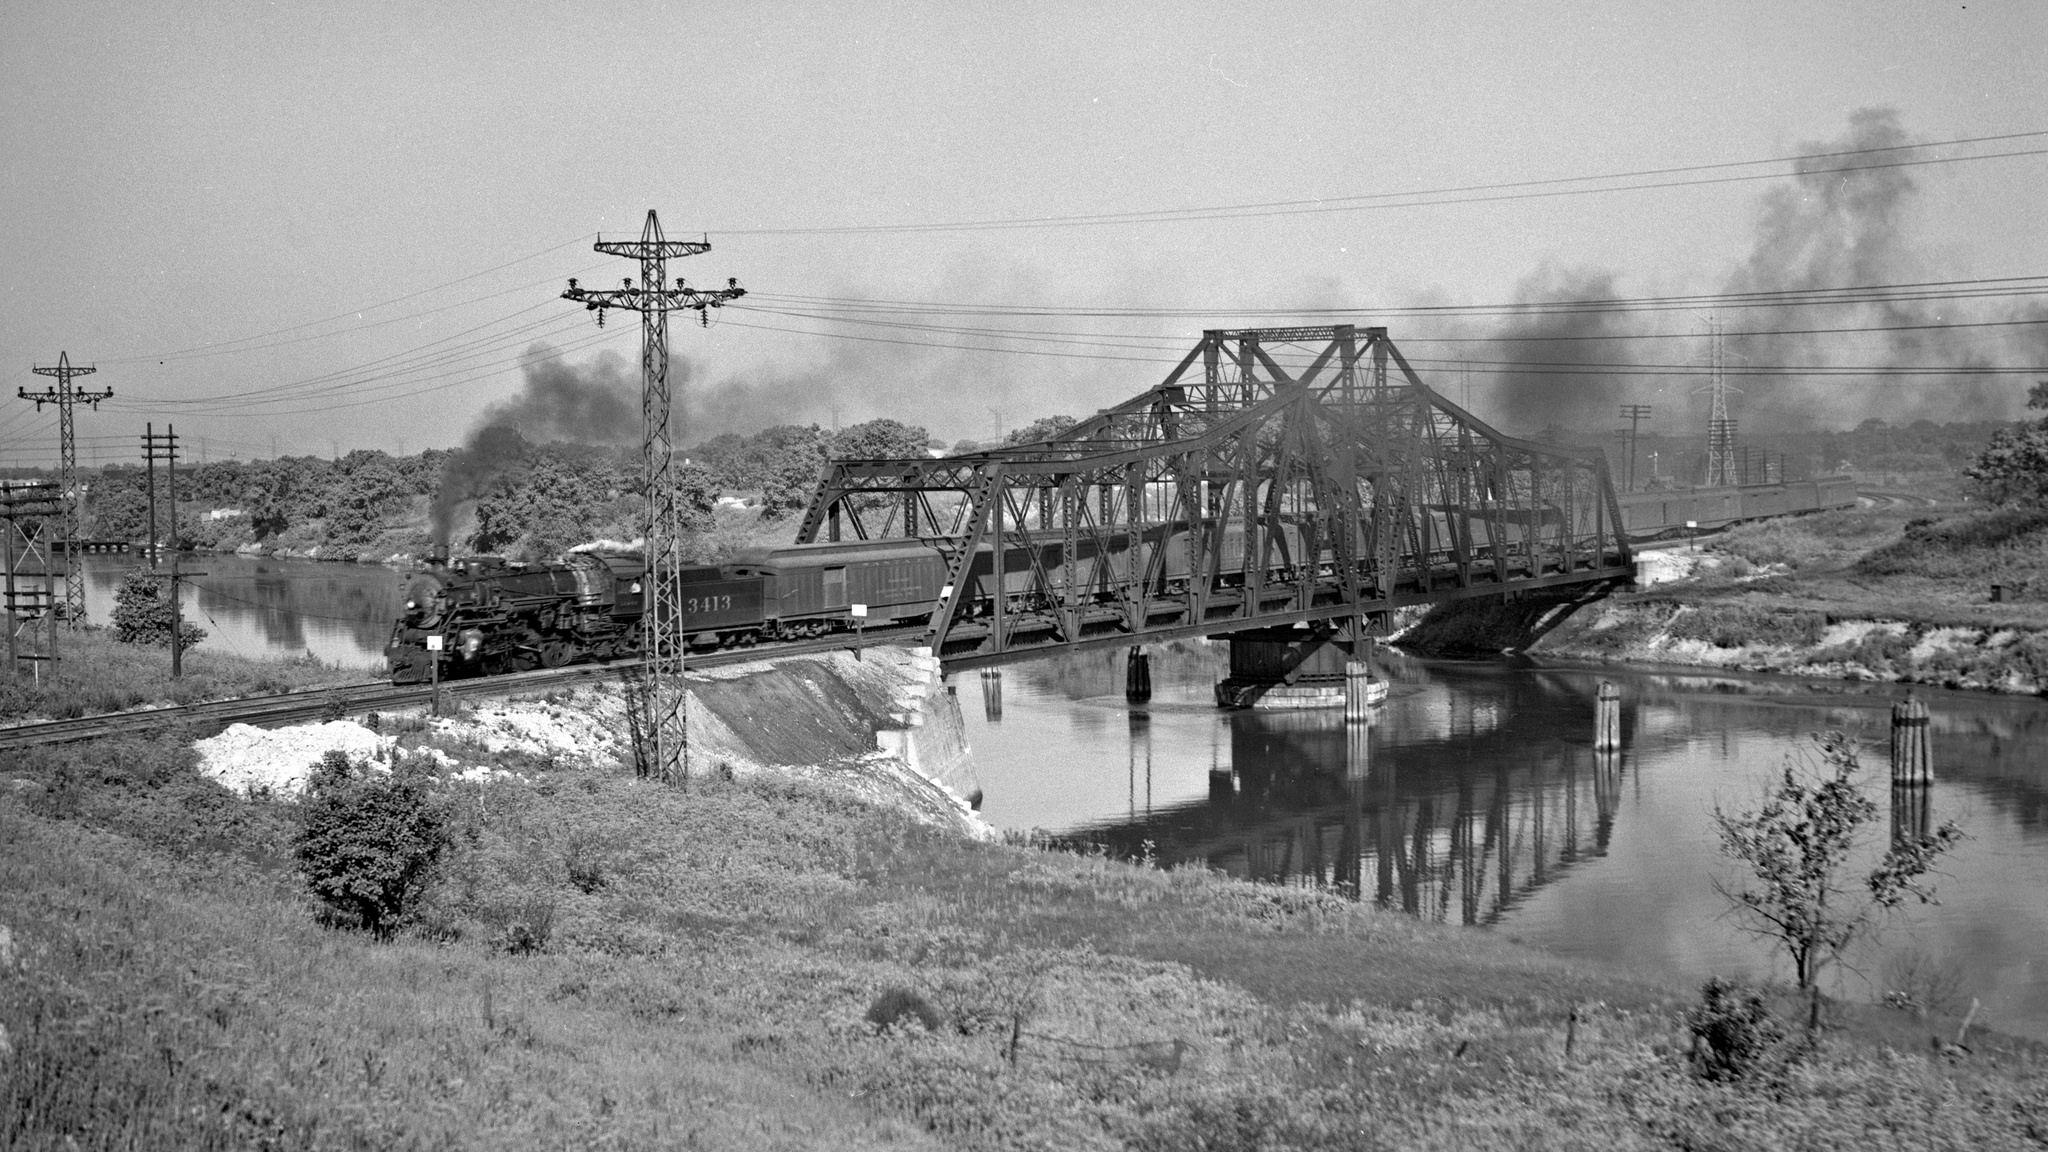 ATSF, Chicago, Illinois, 1946 Railroad photography